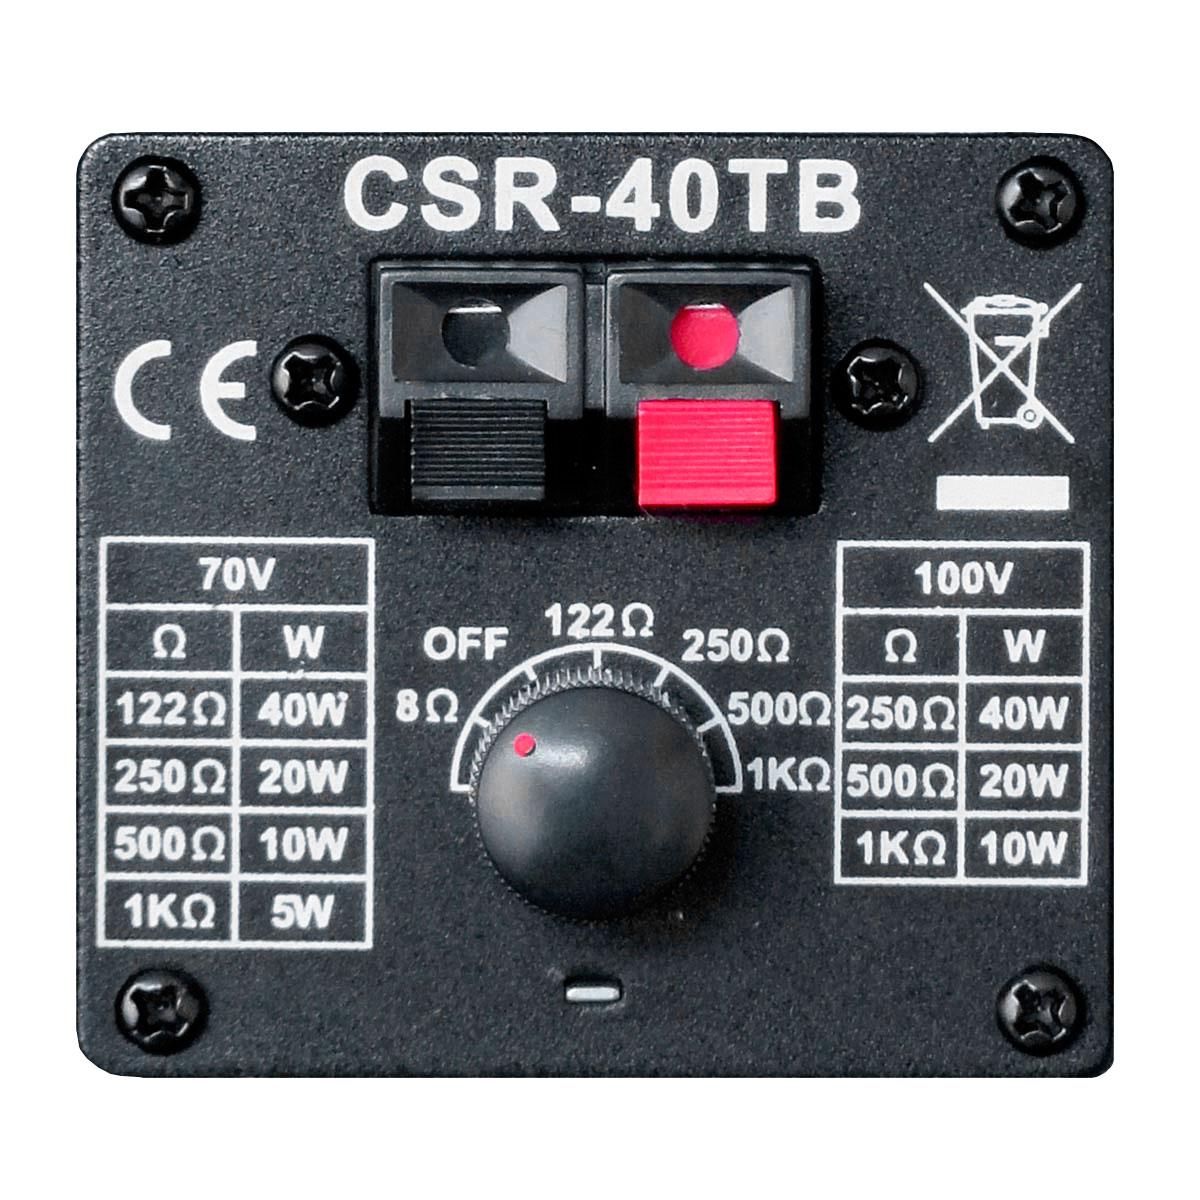 CSR40TB - Caixa Passiva 40W Preta c/ Suporte ( Par ) CSR 40 TB - CSR